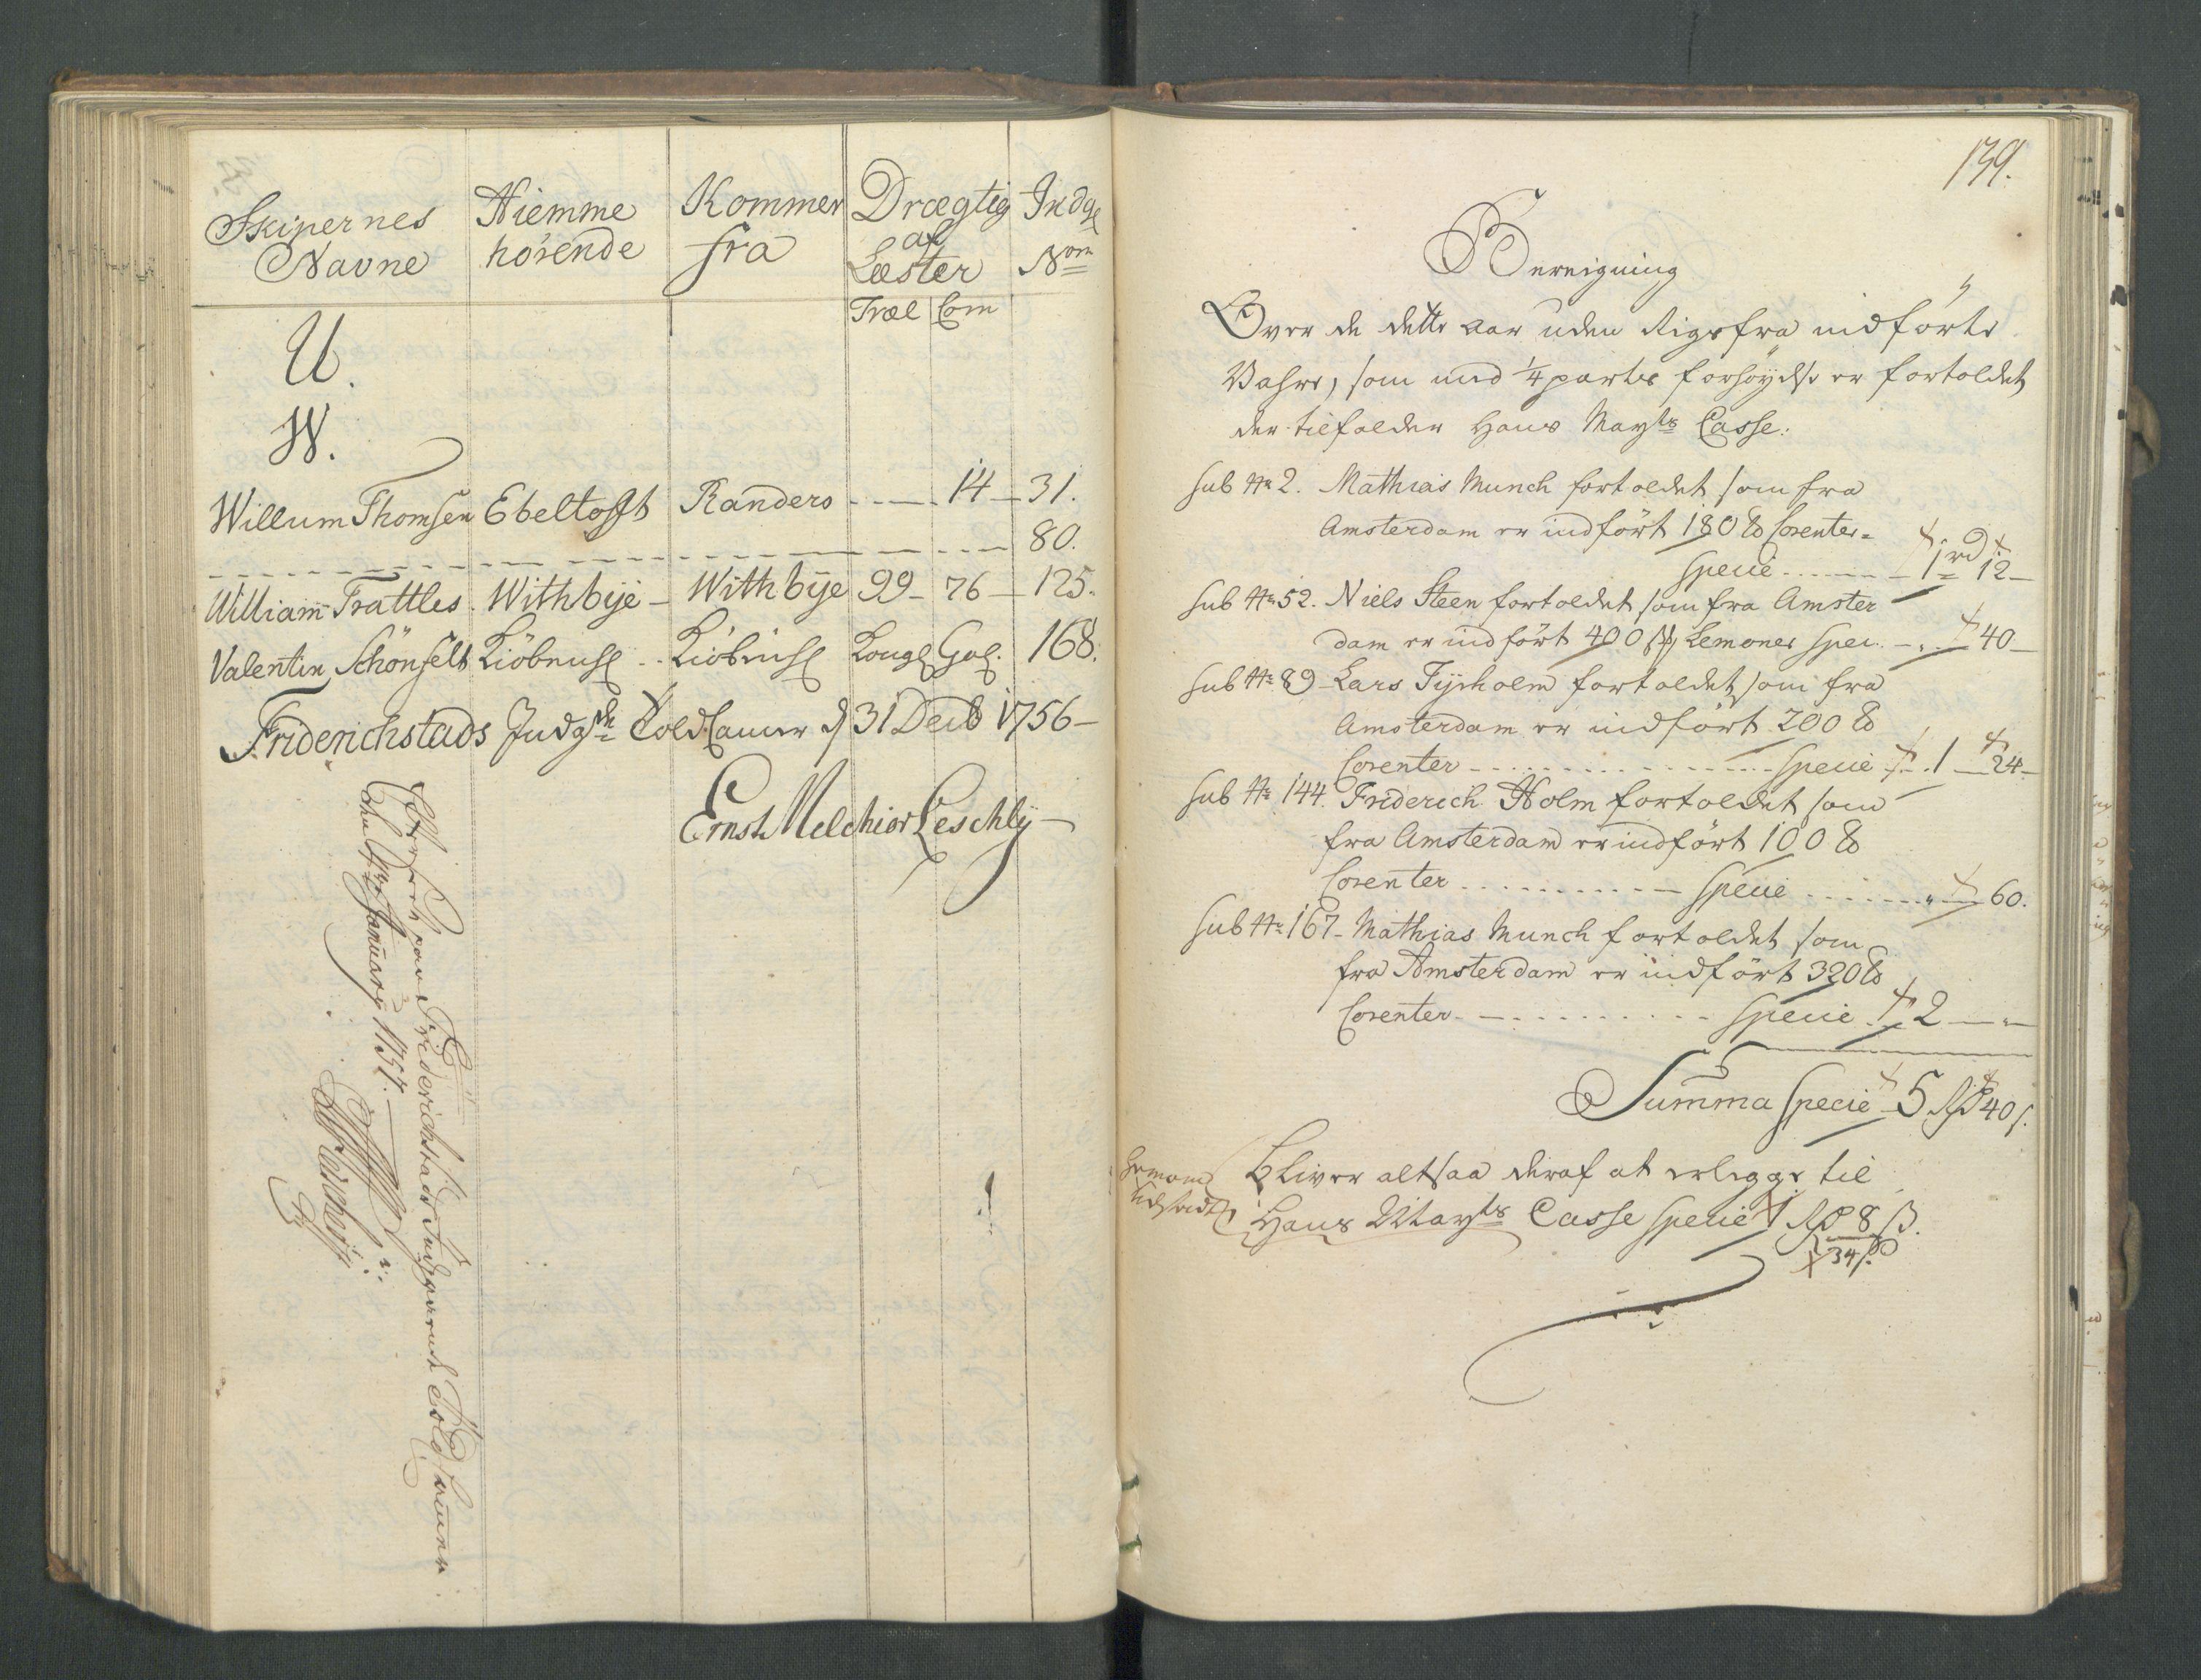 RA, Generaltollkammeret, tollregnskaper, R02/L0022: Tollregnskaper Fredrikstad, 1756, s. 138b-139a